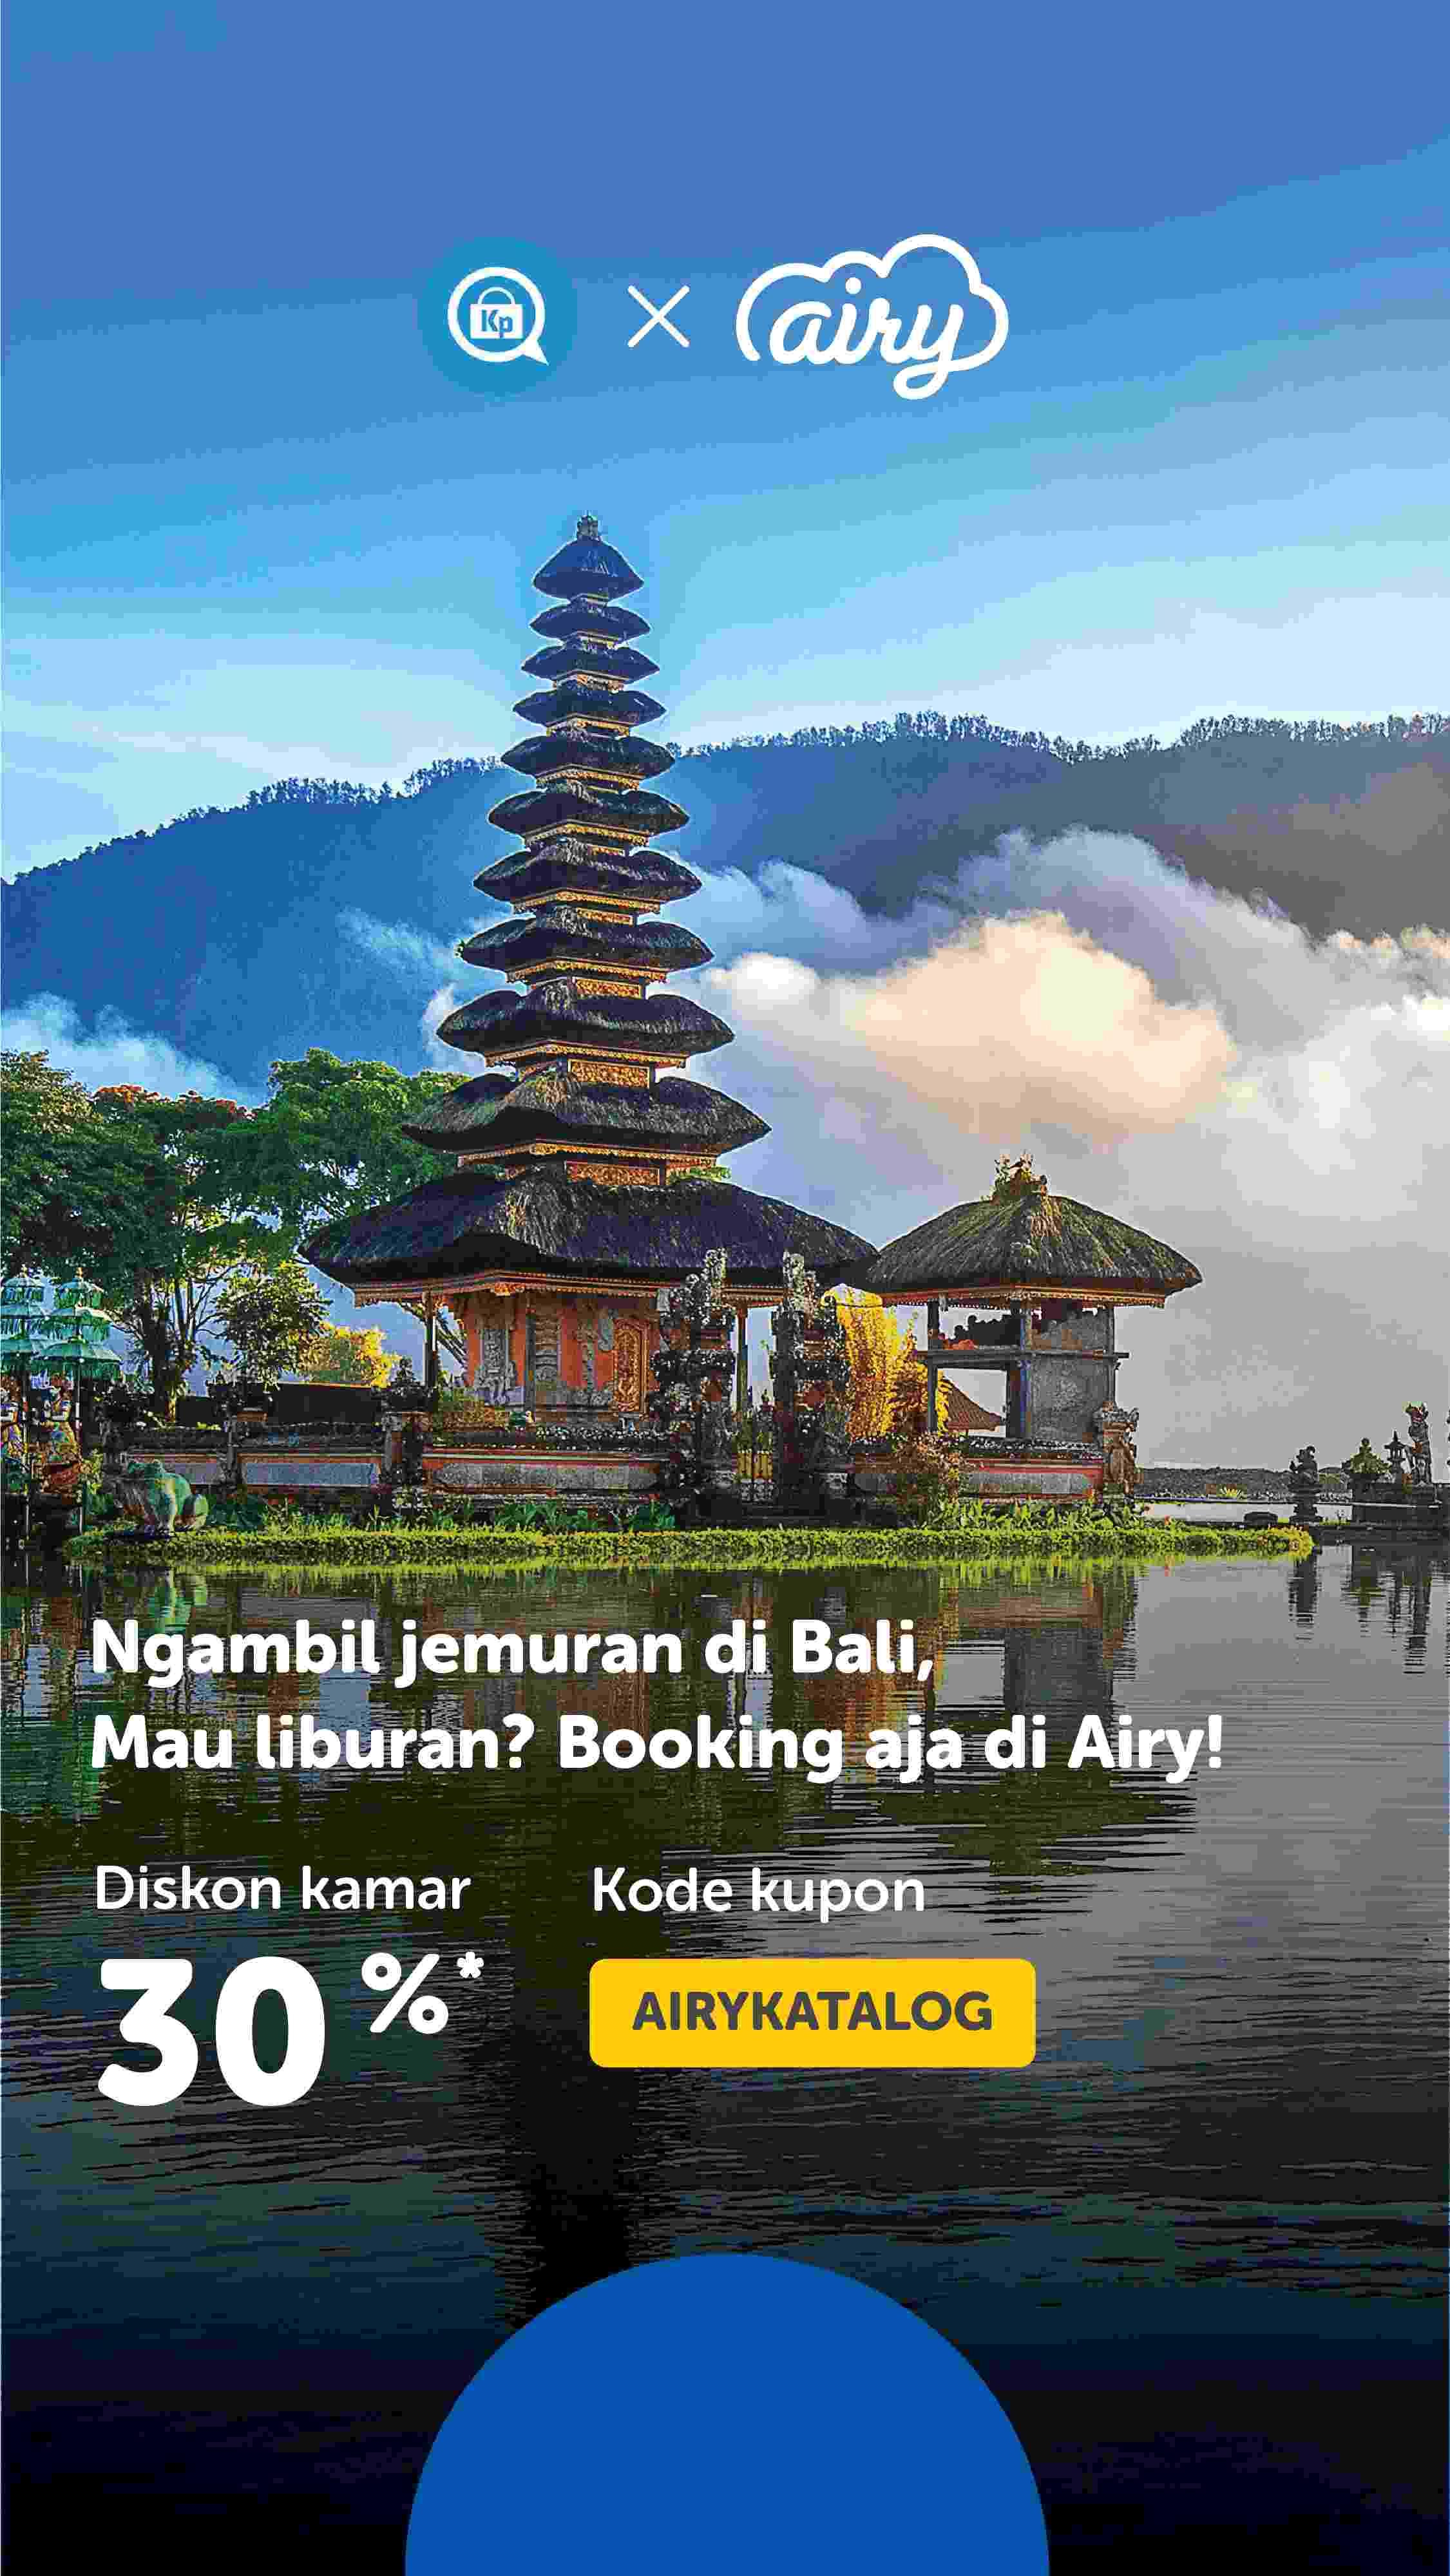 Diskon Airy Promo Diskon Kamar 30%